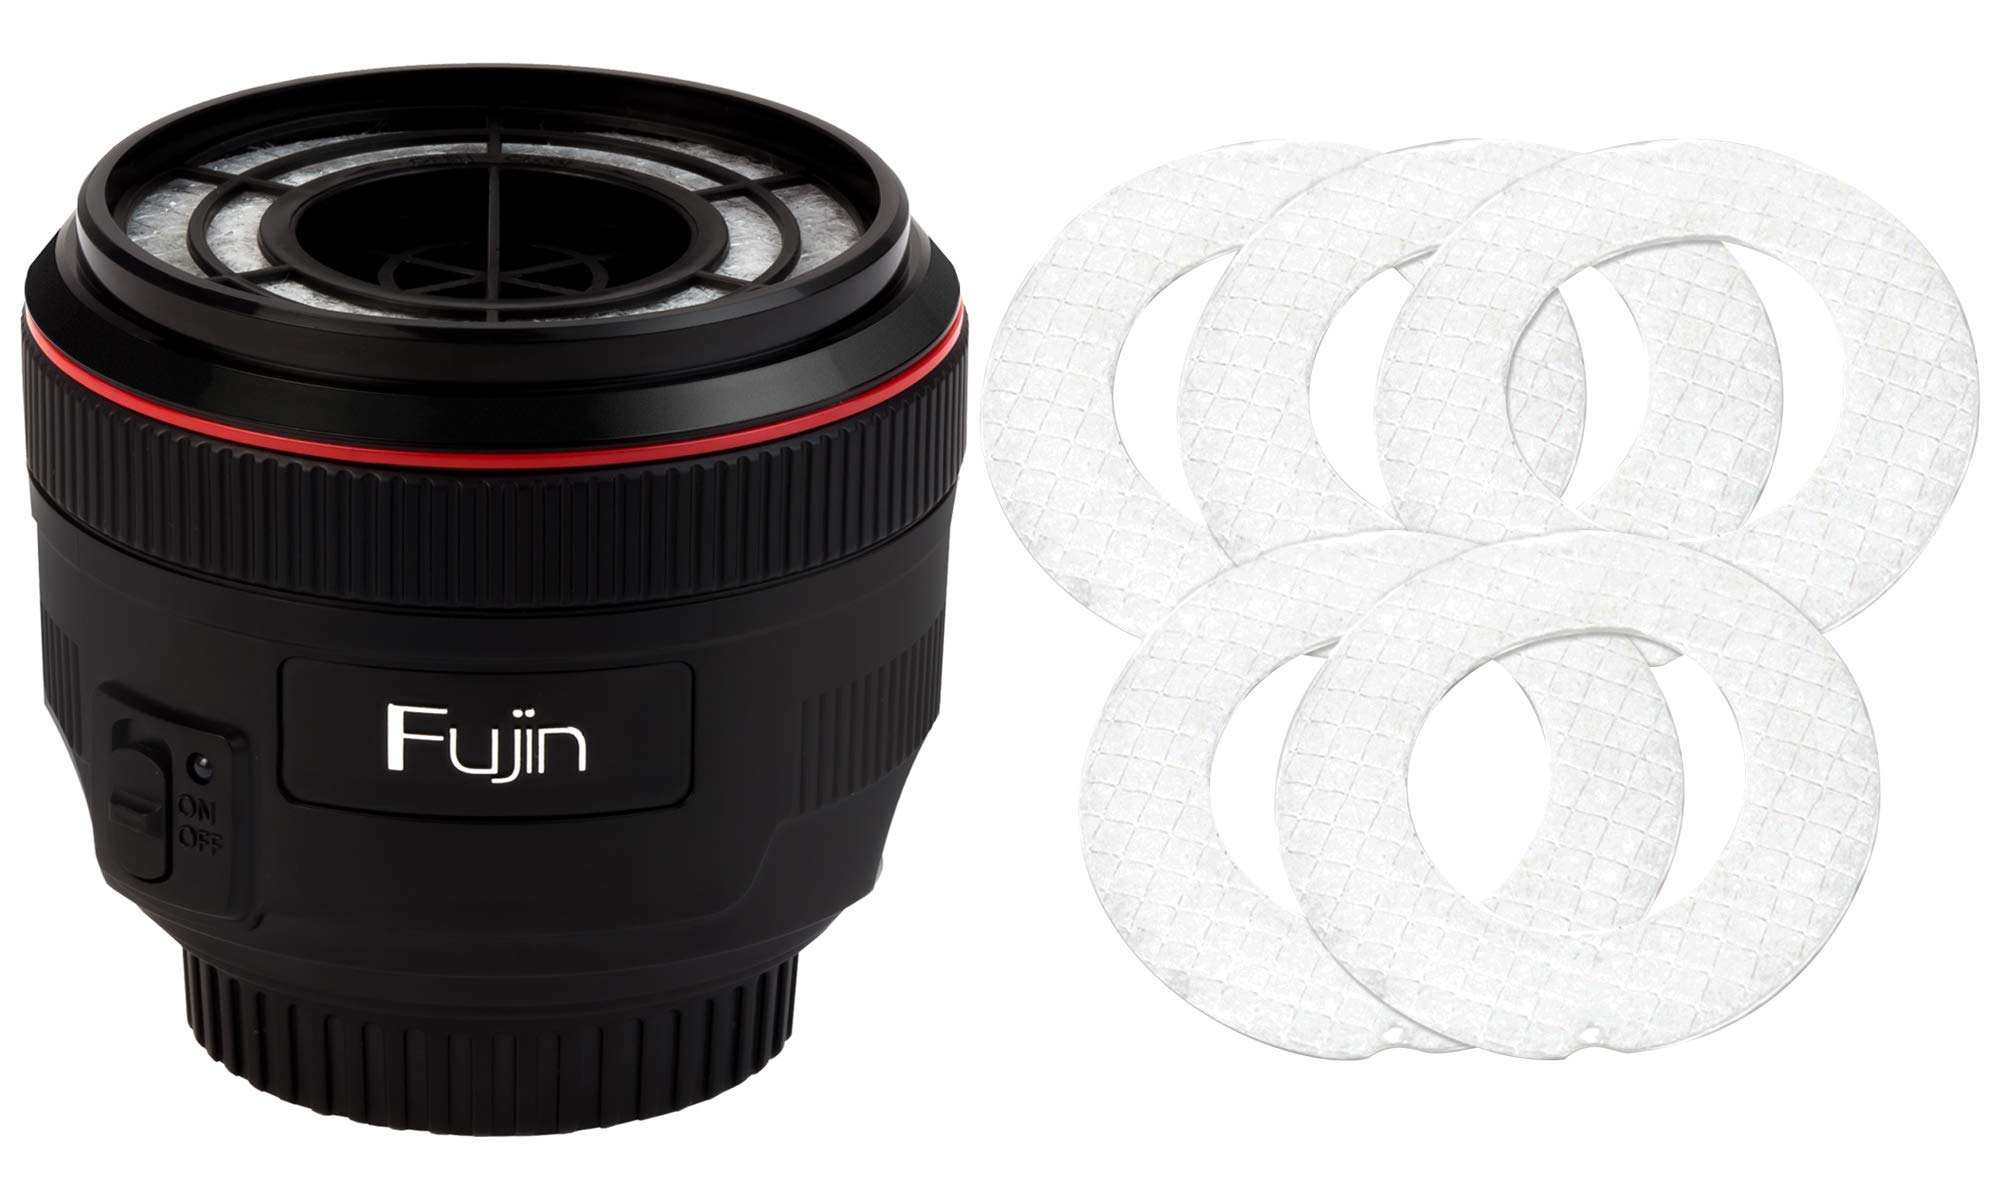 Fujin Mark 2/R/Camera Cleaning kit/Filter Set for Canon EF-Mount Model